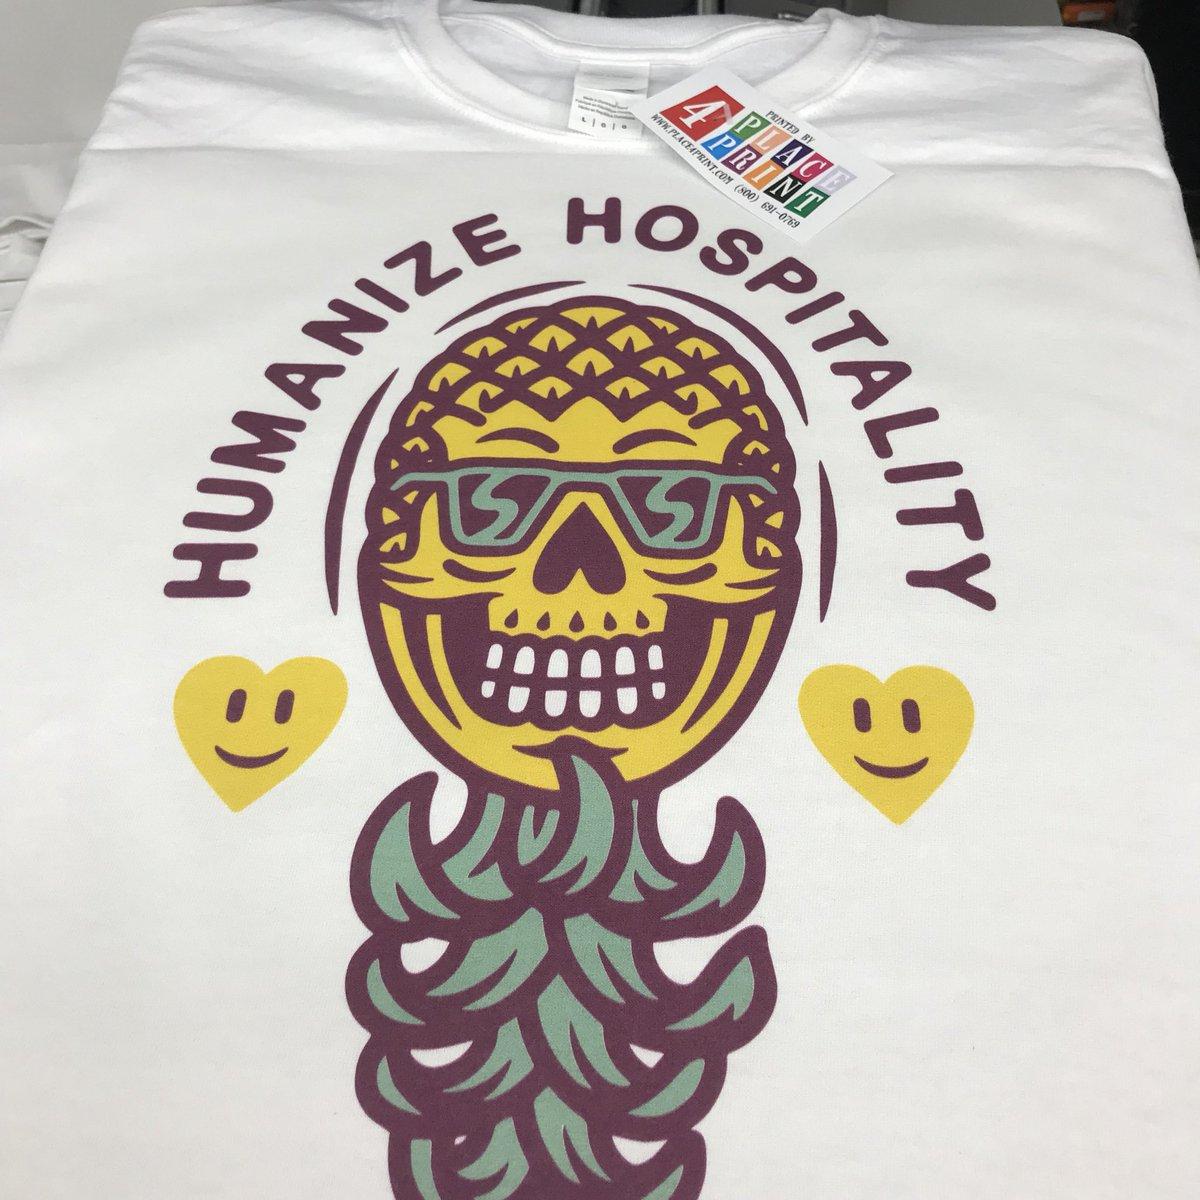 Custom Made T Shirts Cheap No Minimum Rldm